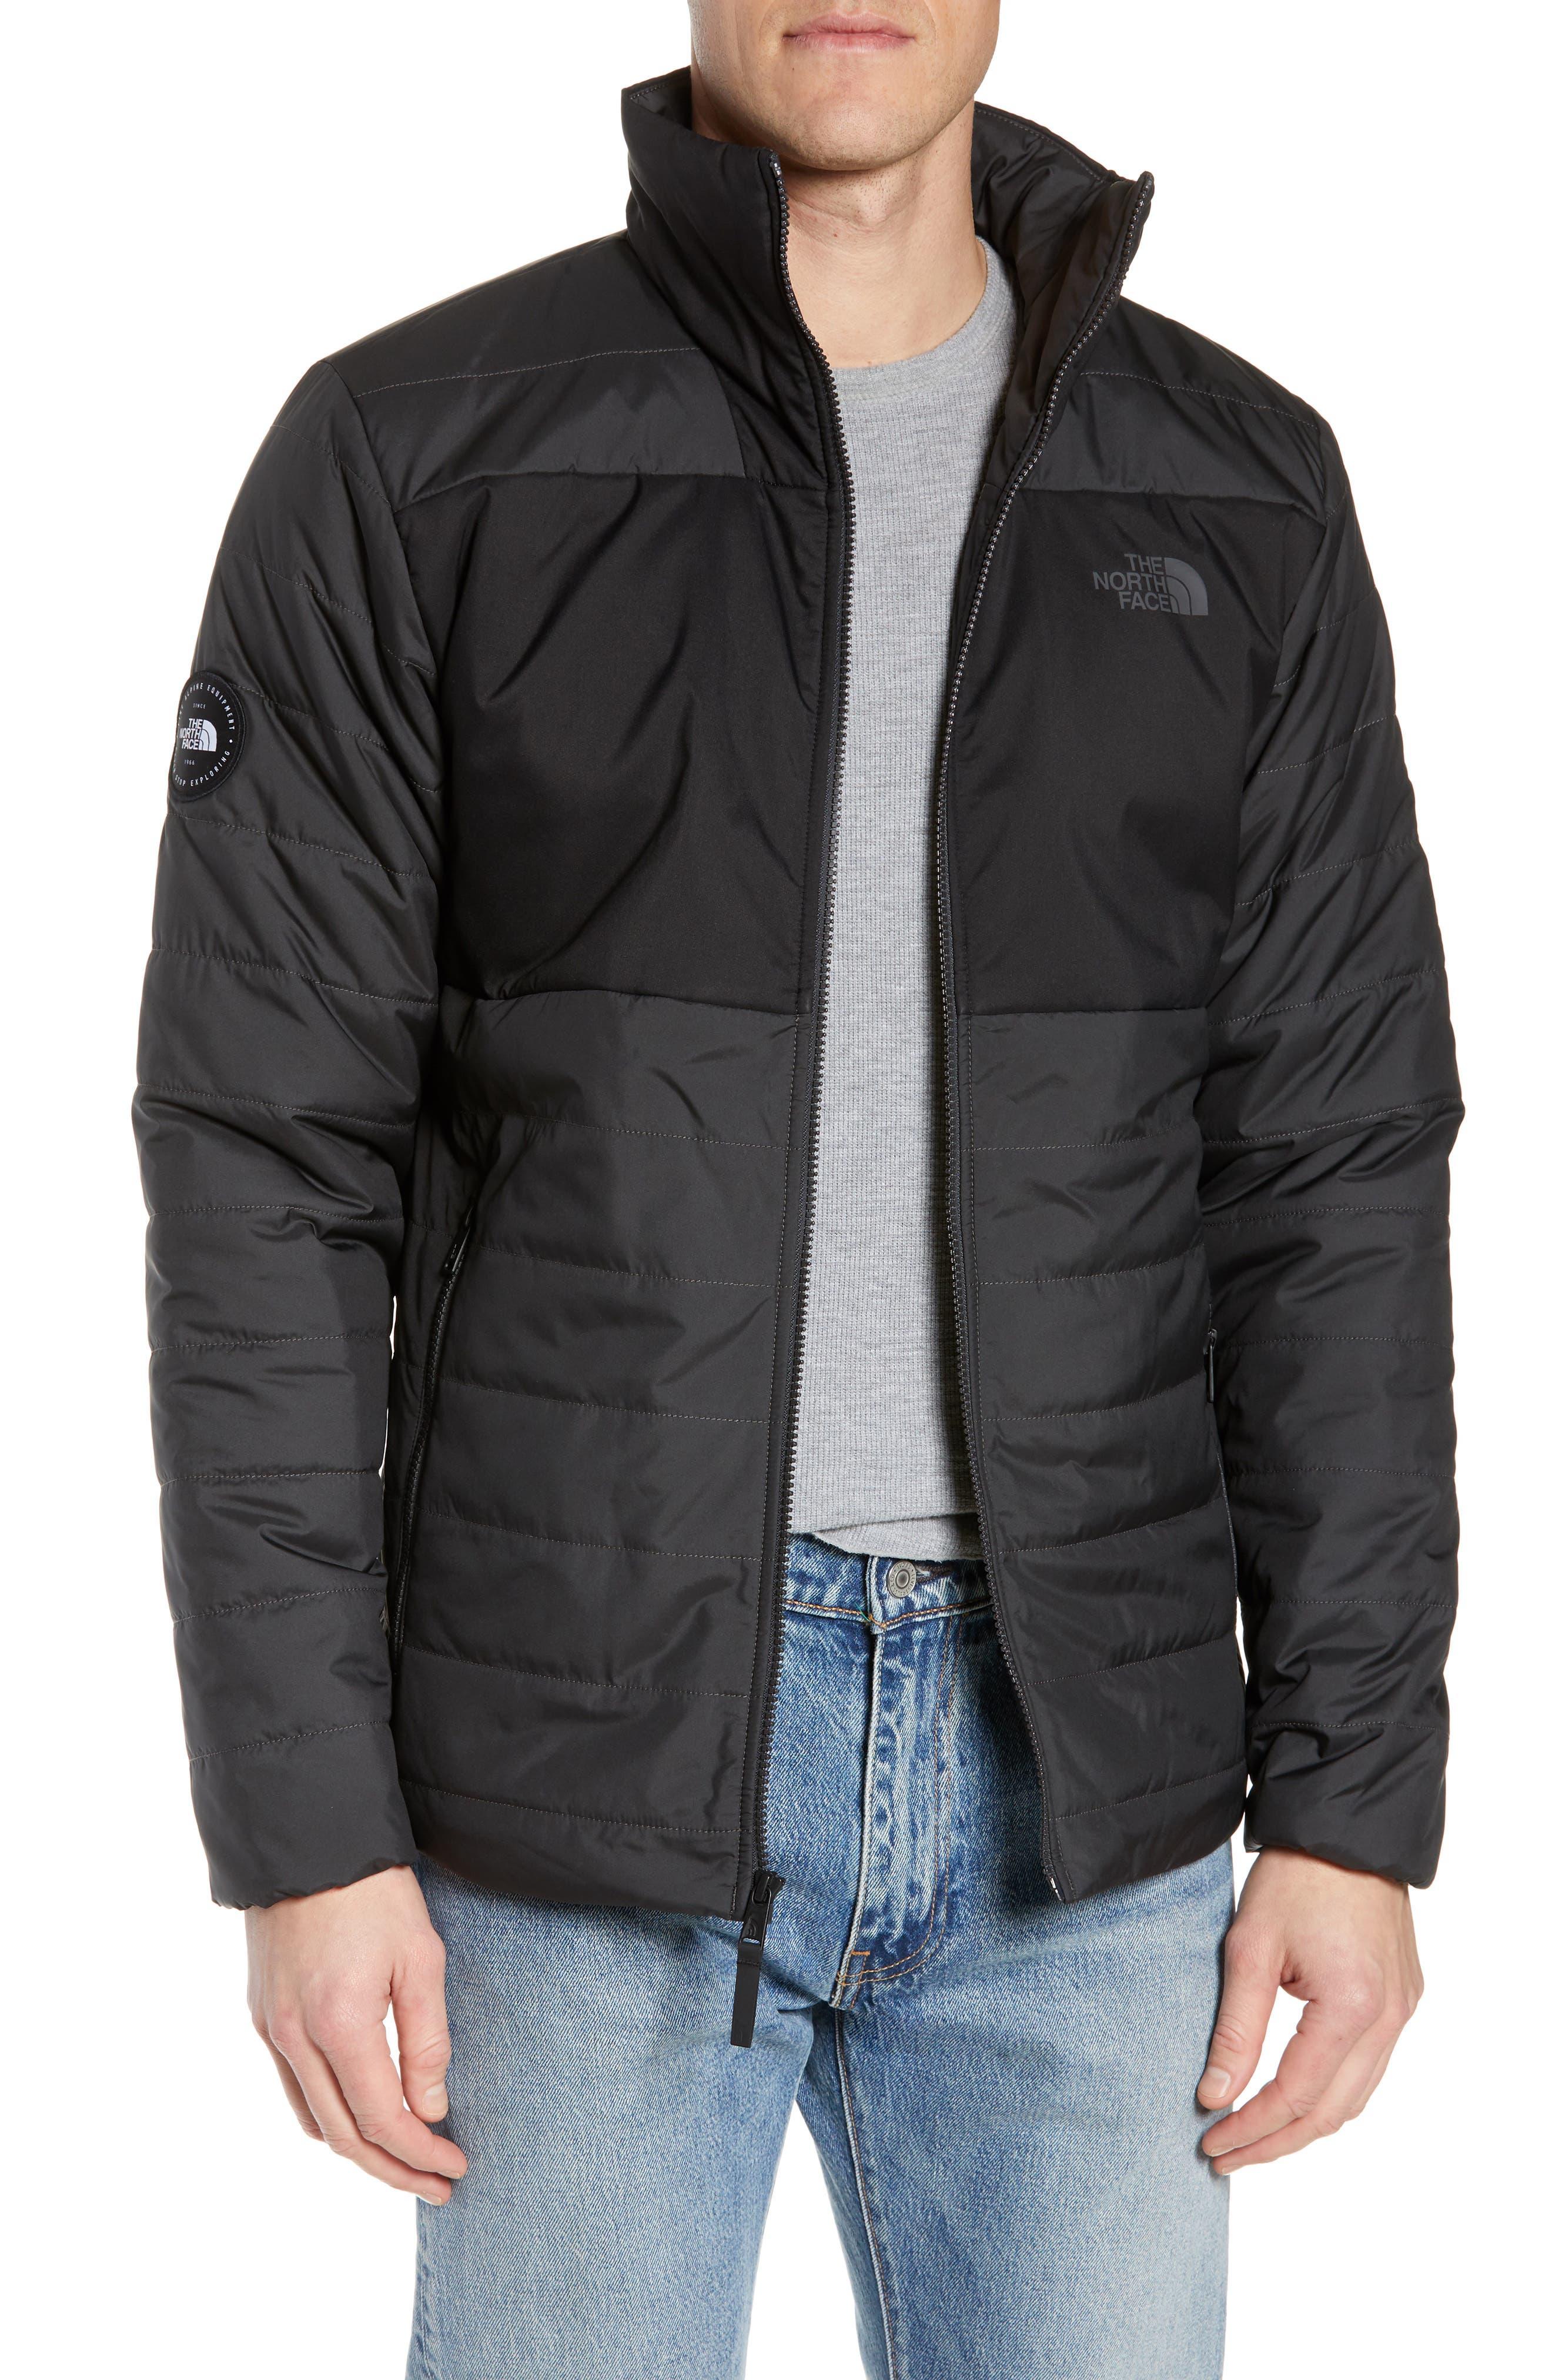 THE NORTH FACE, Insulated Jacket, Main thumbnail 1, color, TNF BLACK/ ASPHALT GREY